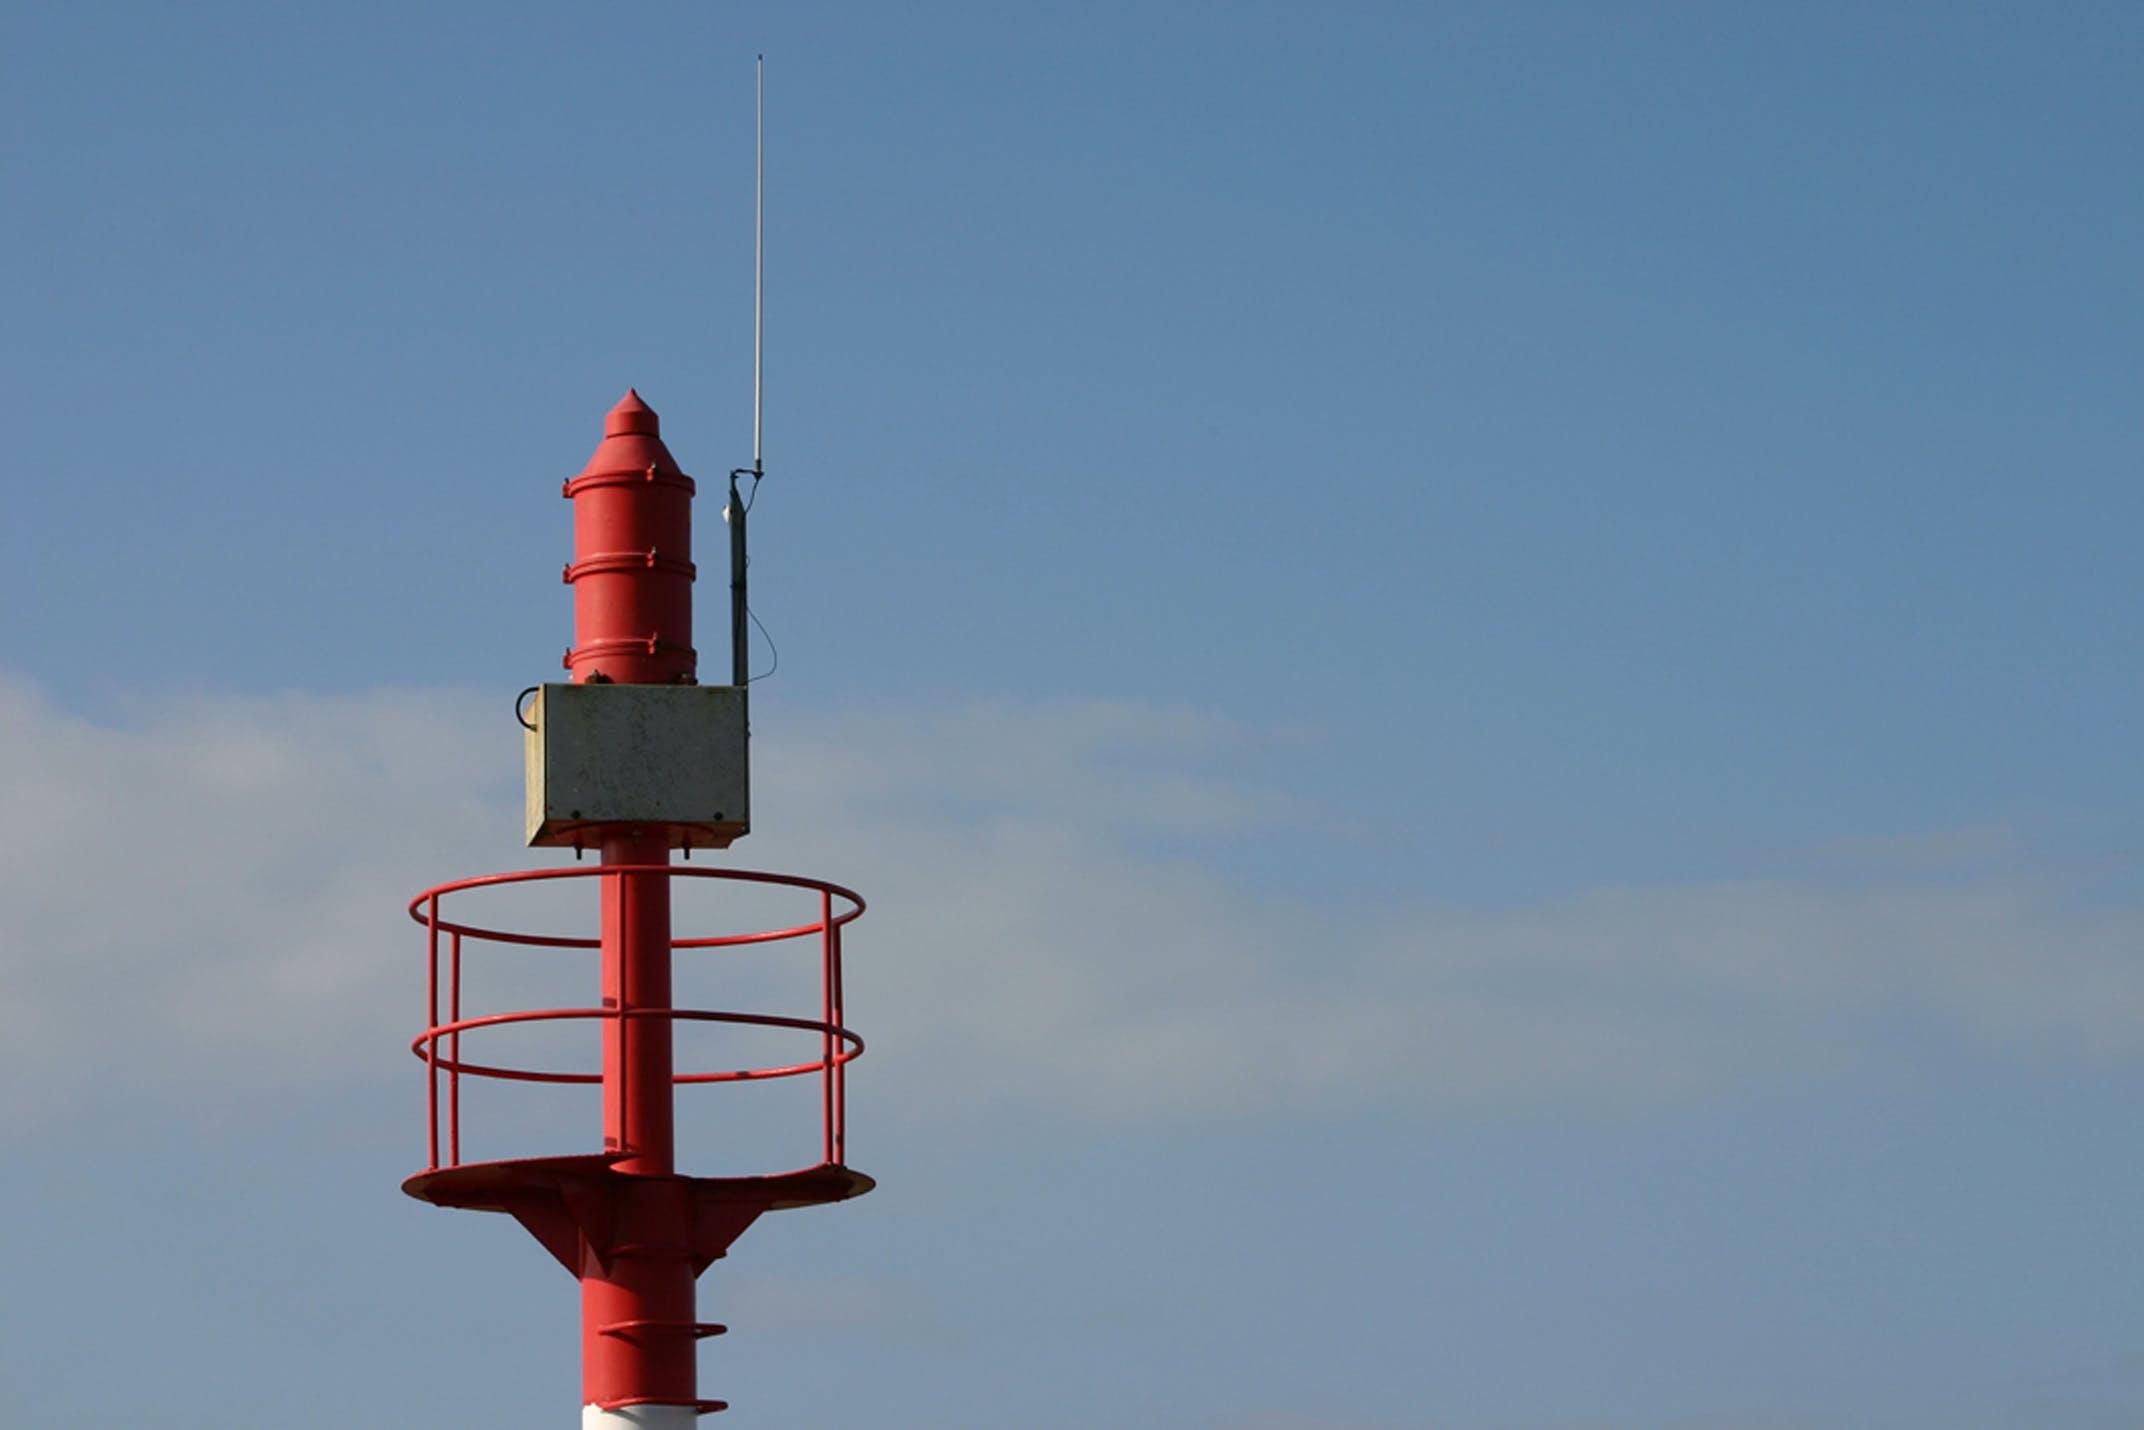 Free stock photo of radar bord de mer